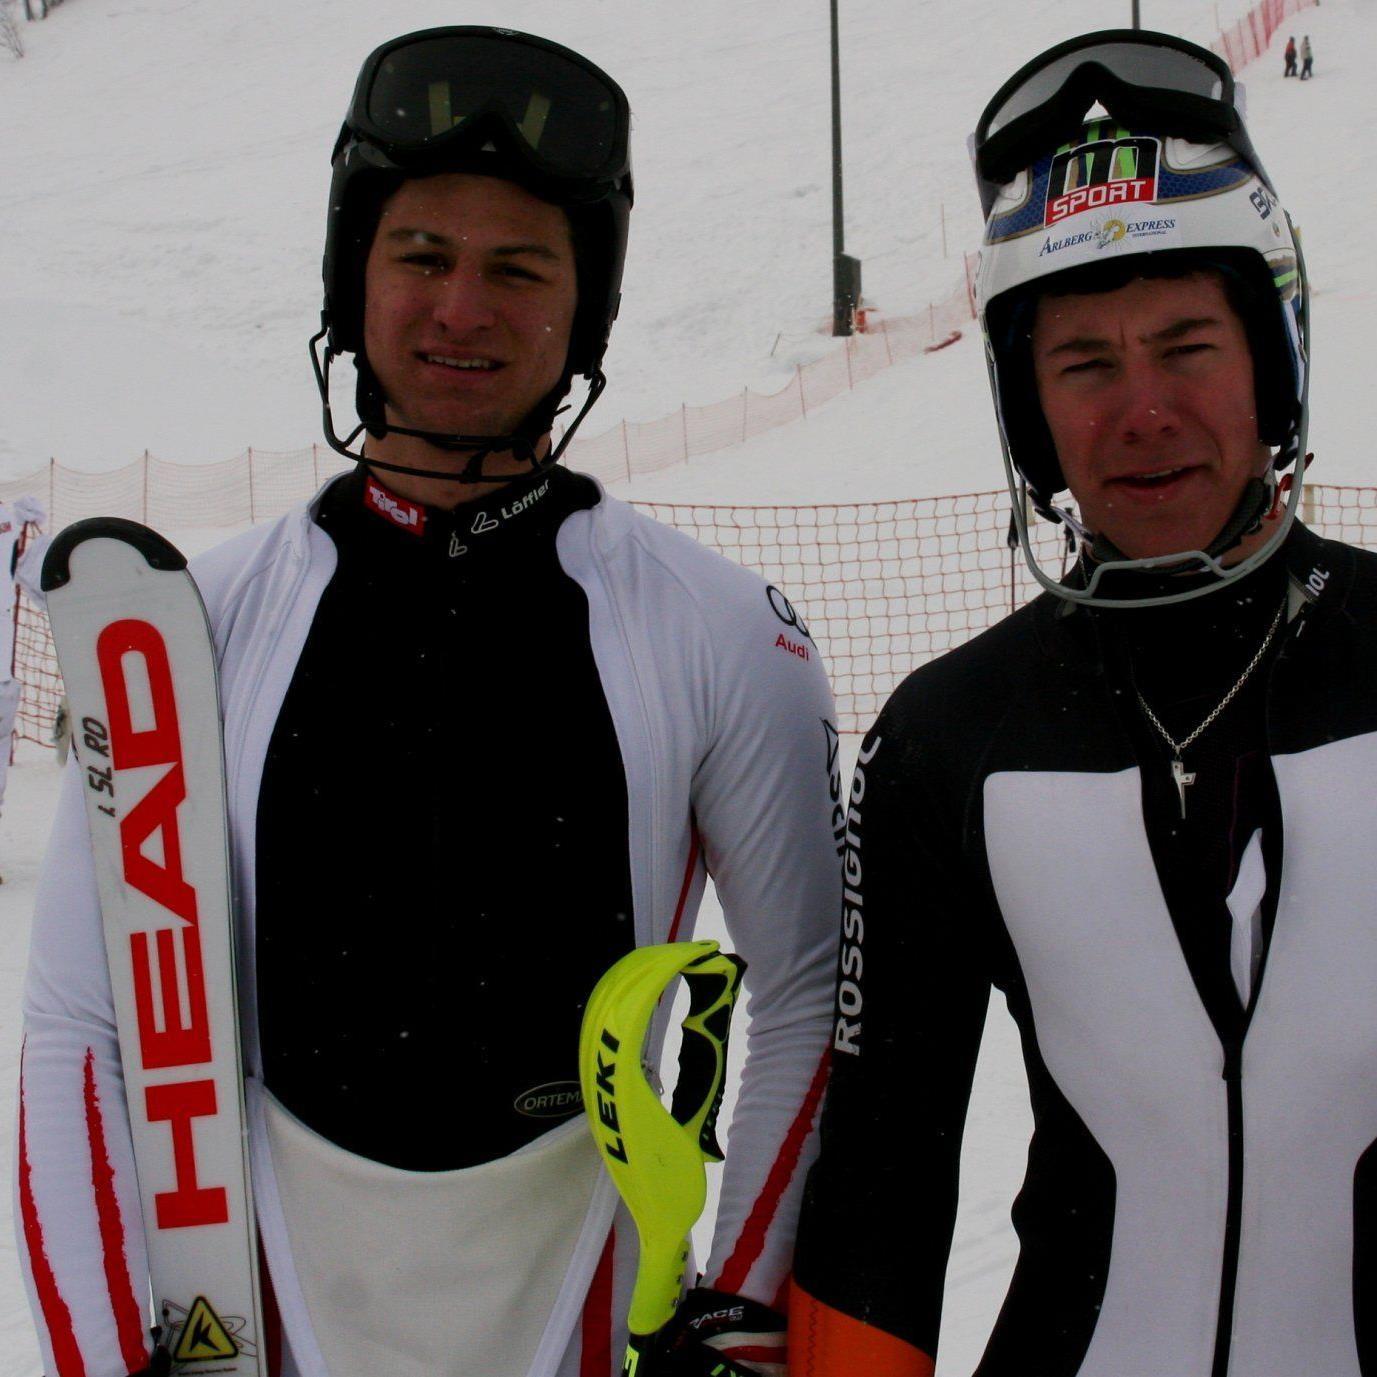 Mathias Graf holte ÖM-Gold, Johannes Strolz erobert die Bronzene.